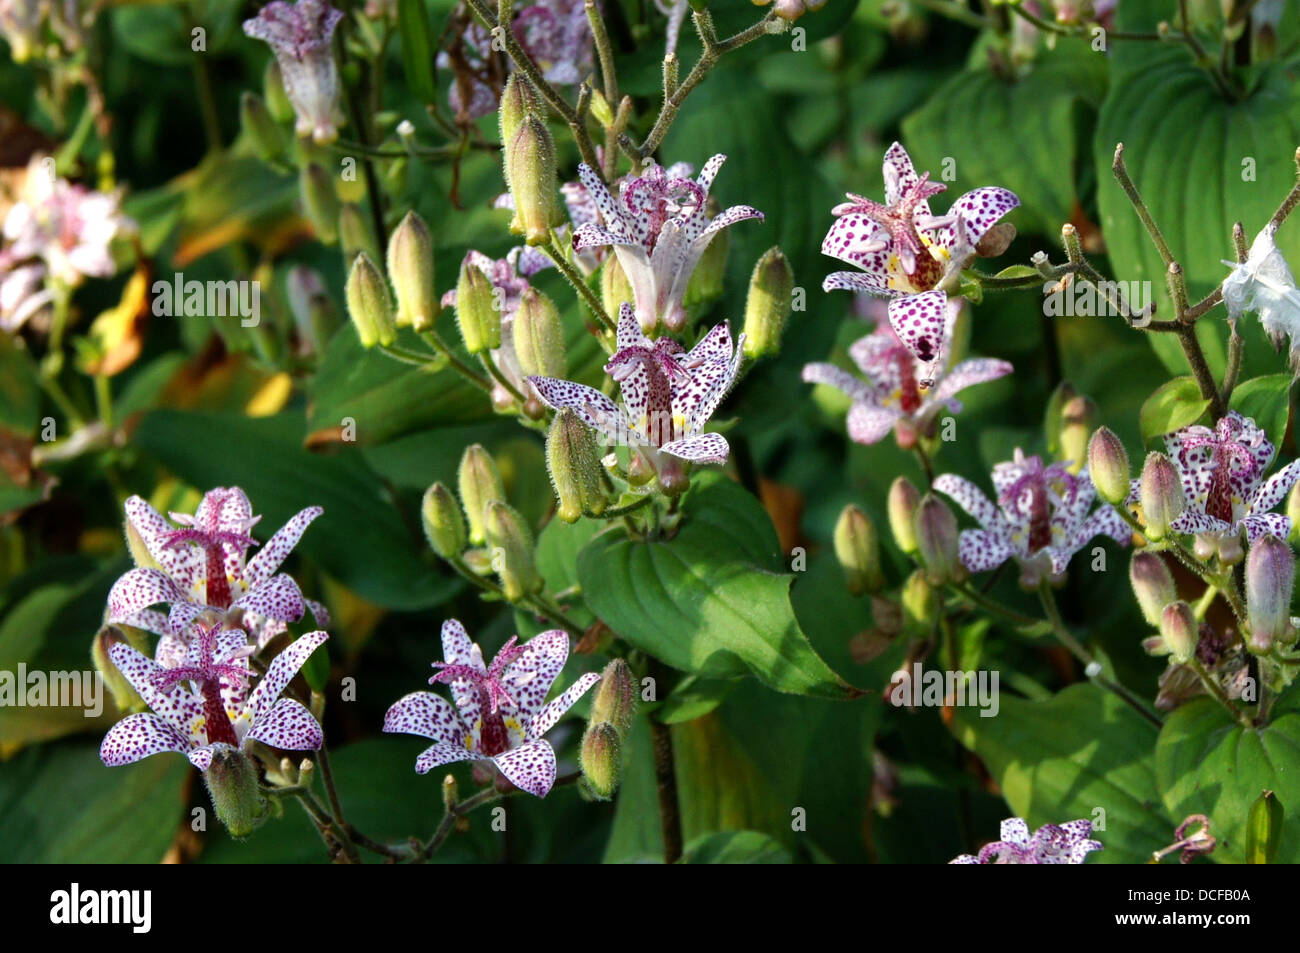 Formosana Stockfotos & Formosana Bilder - Alamy